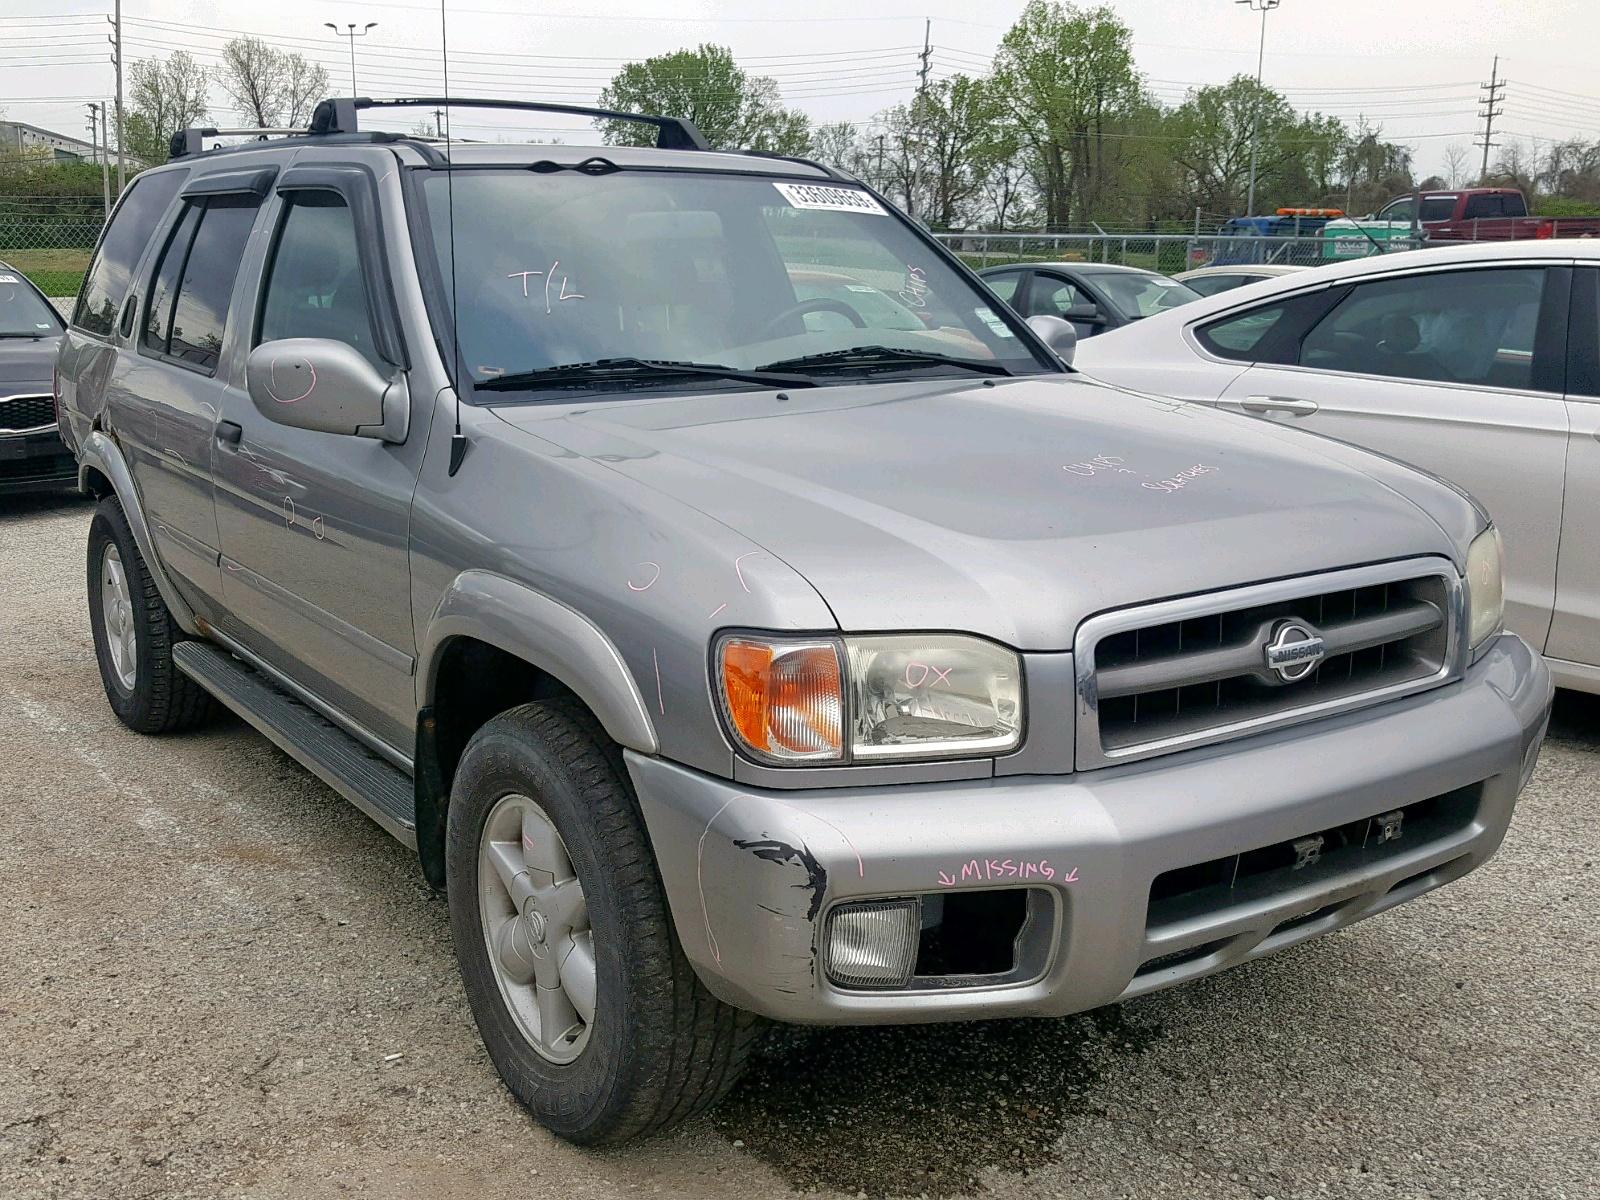 Salvage 2001 Nissan PATHFINDER for sale